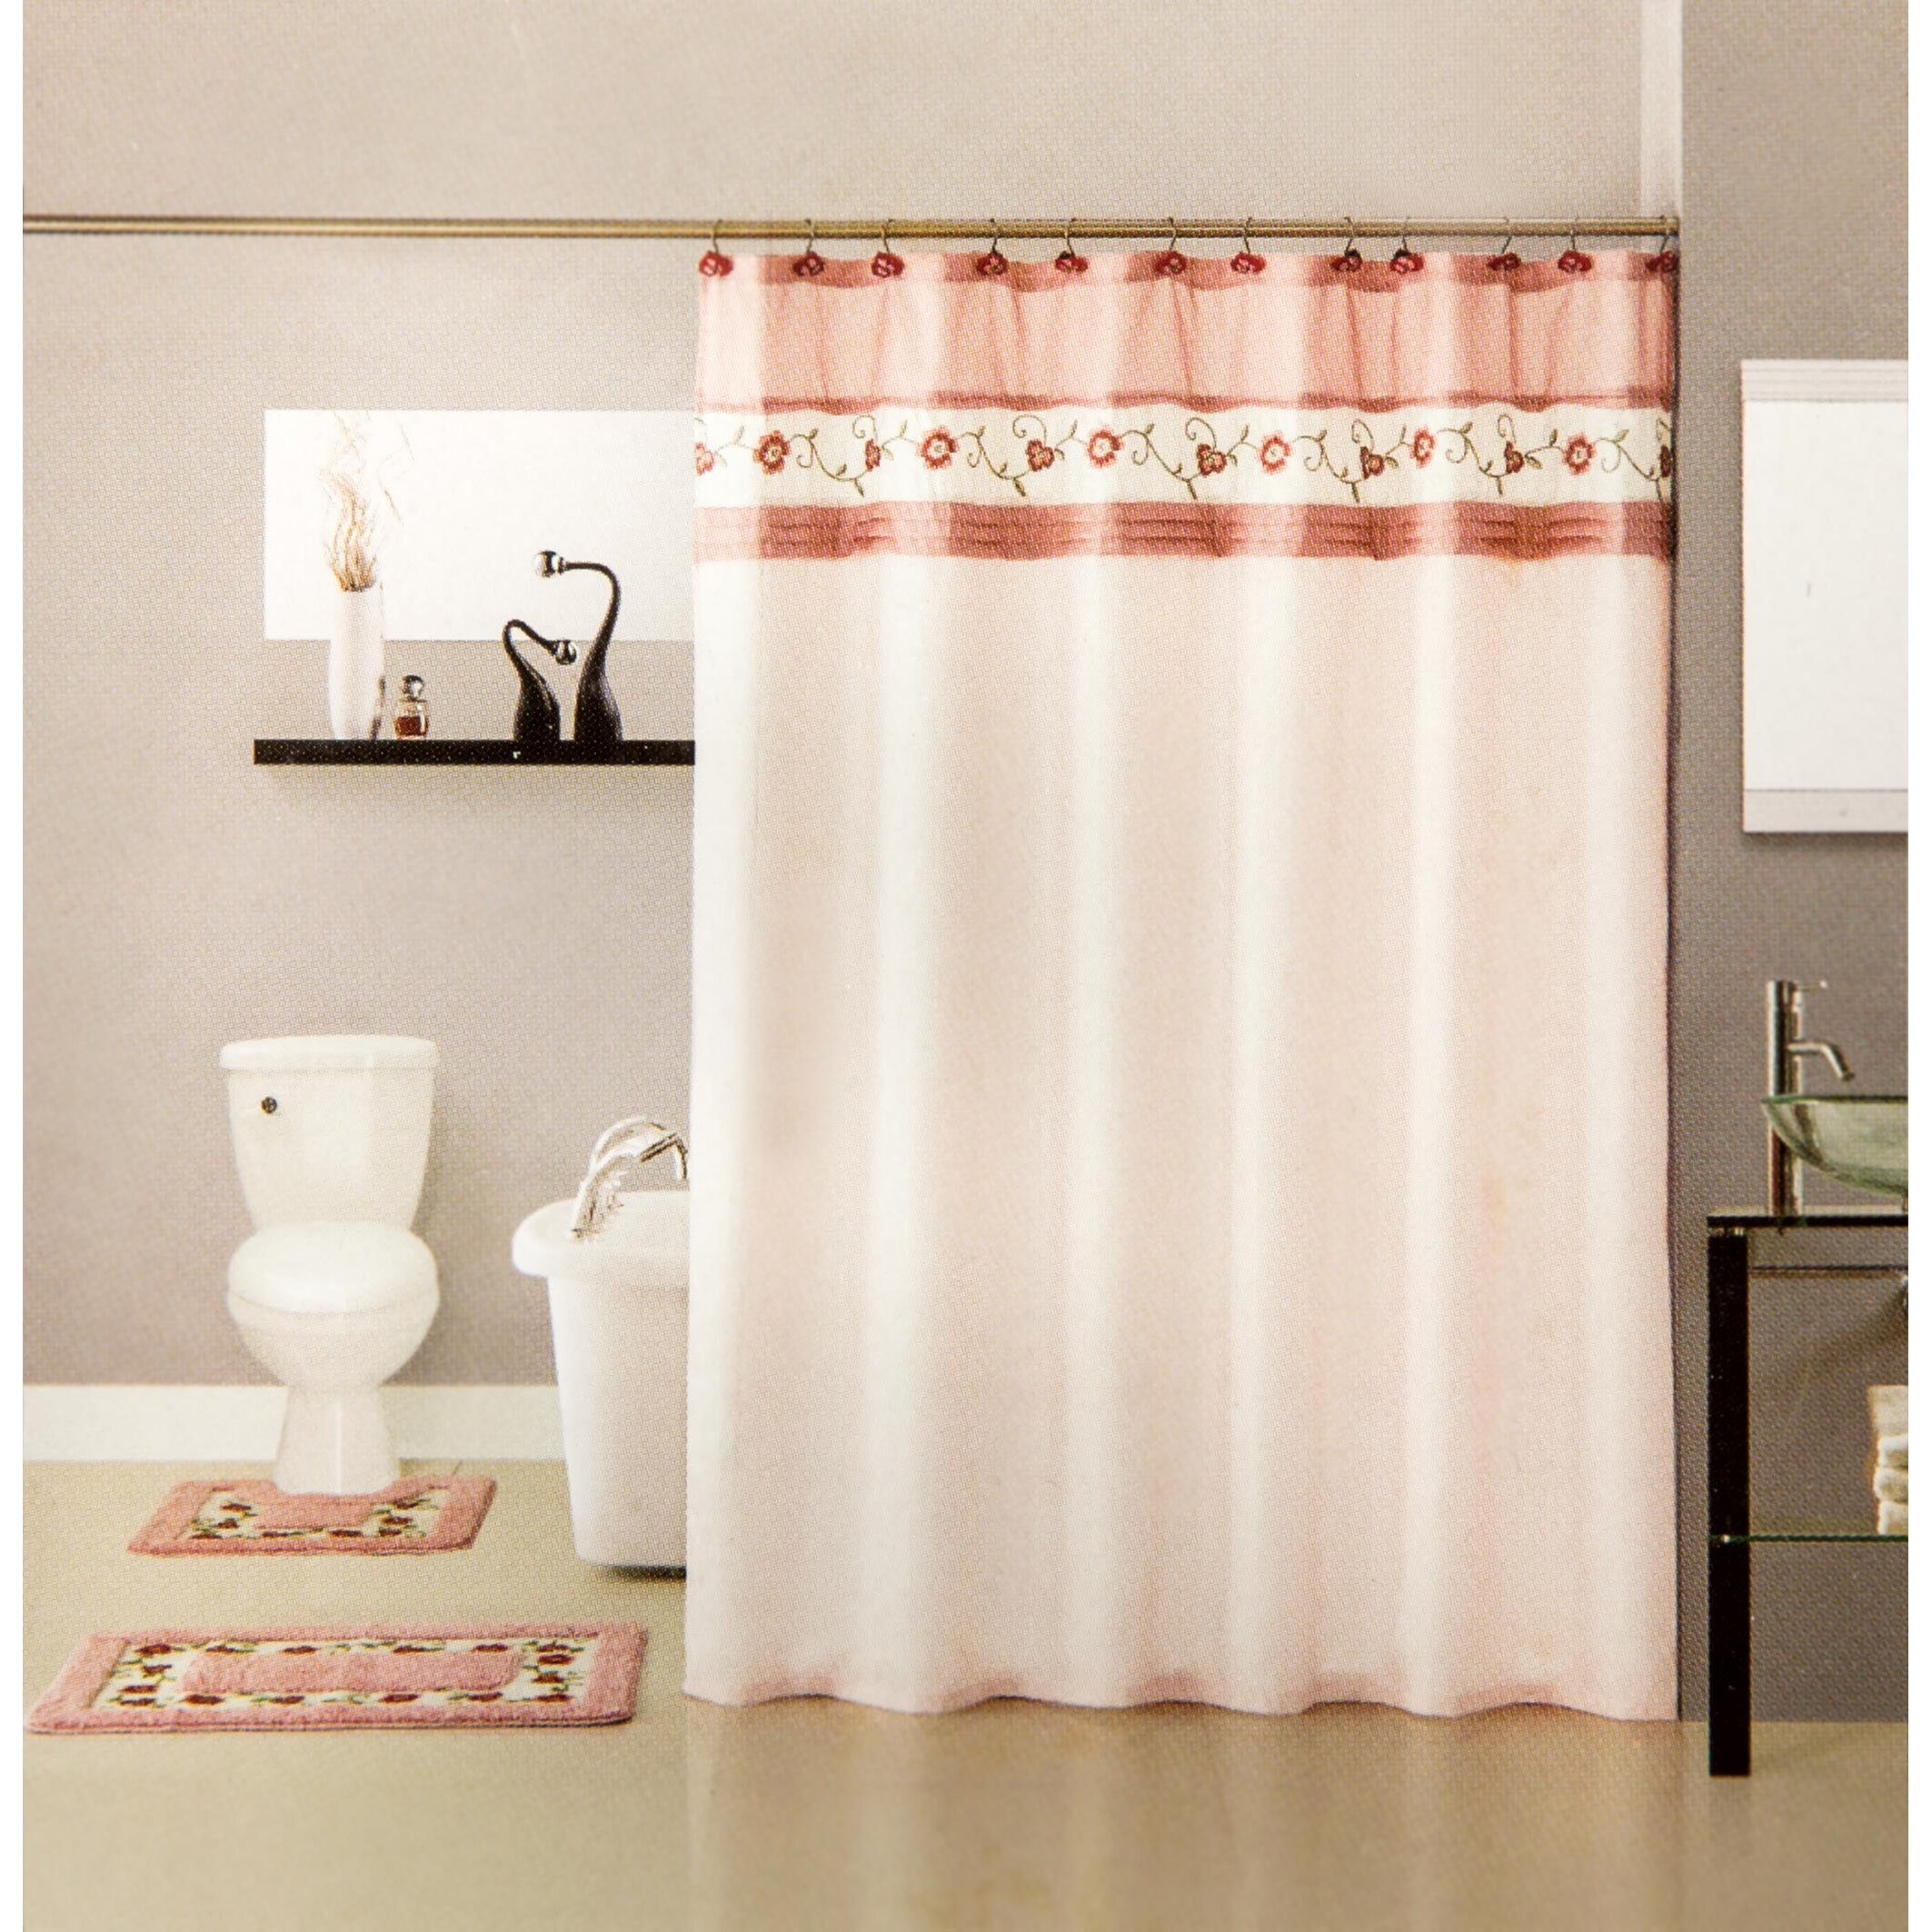 15 piece floral bath mat and shower curtain set wayfair kids shower curtain and bath mat set personalized shower